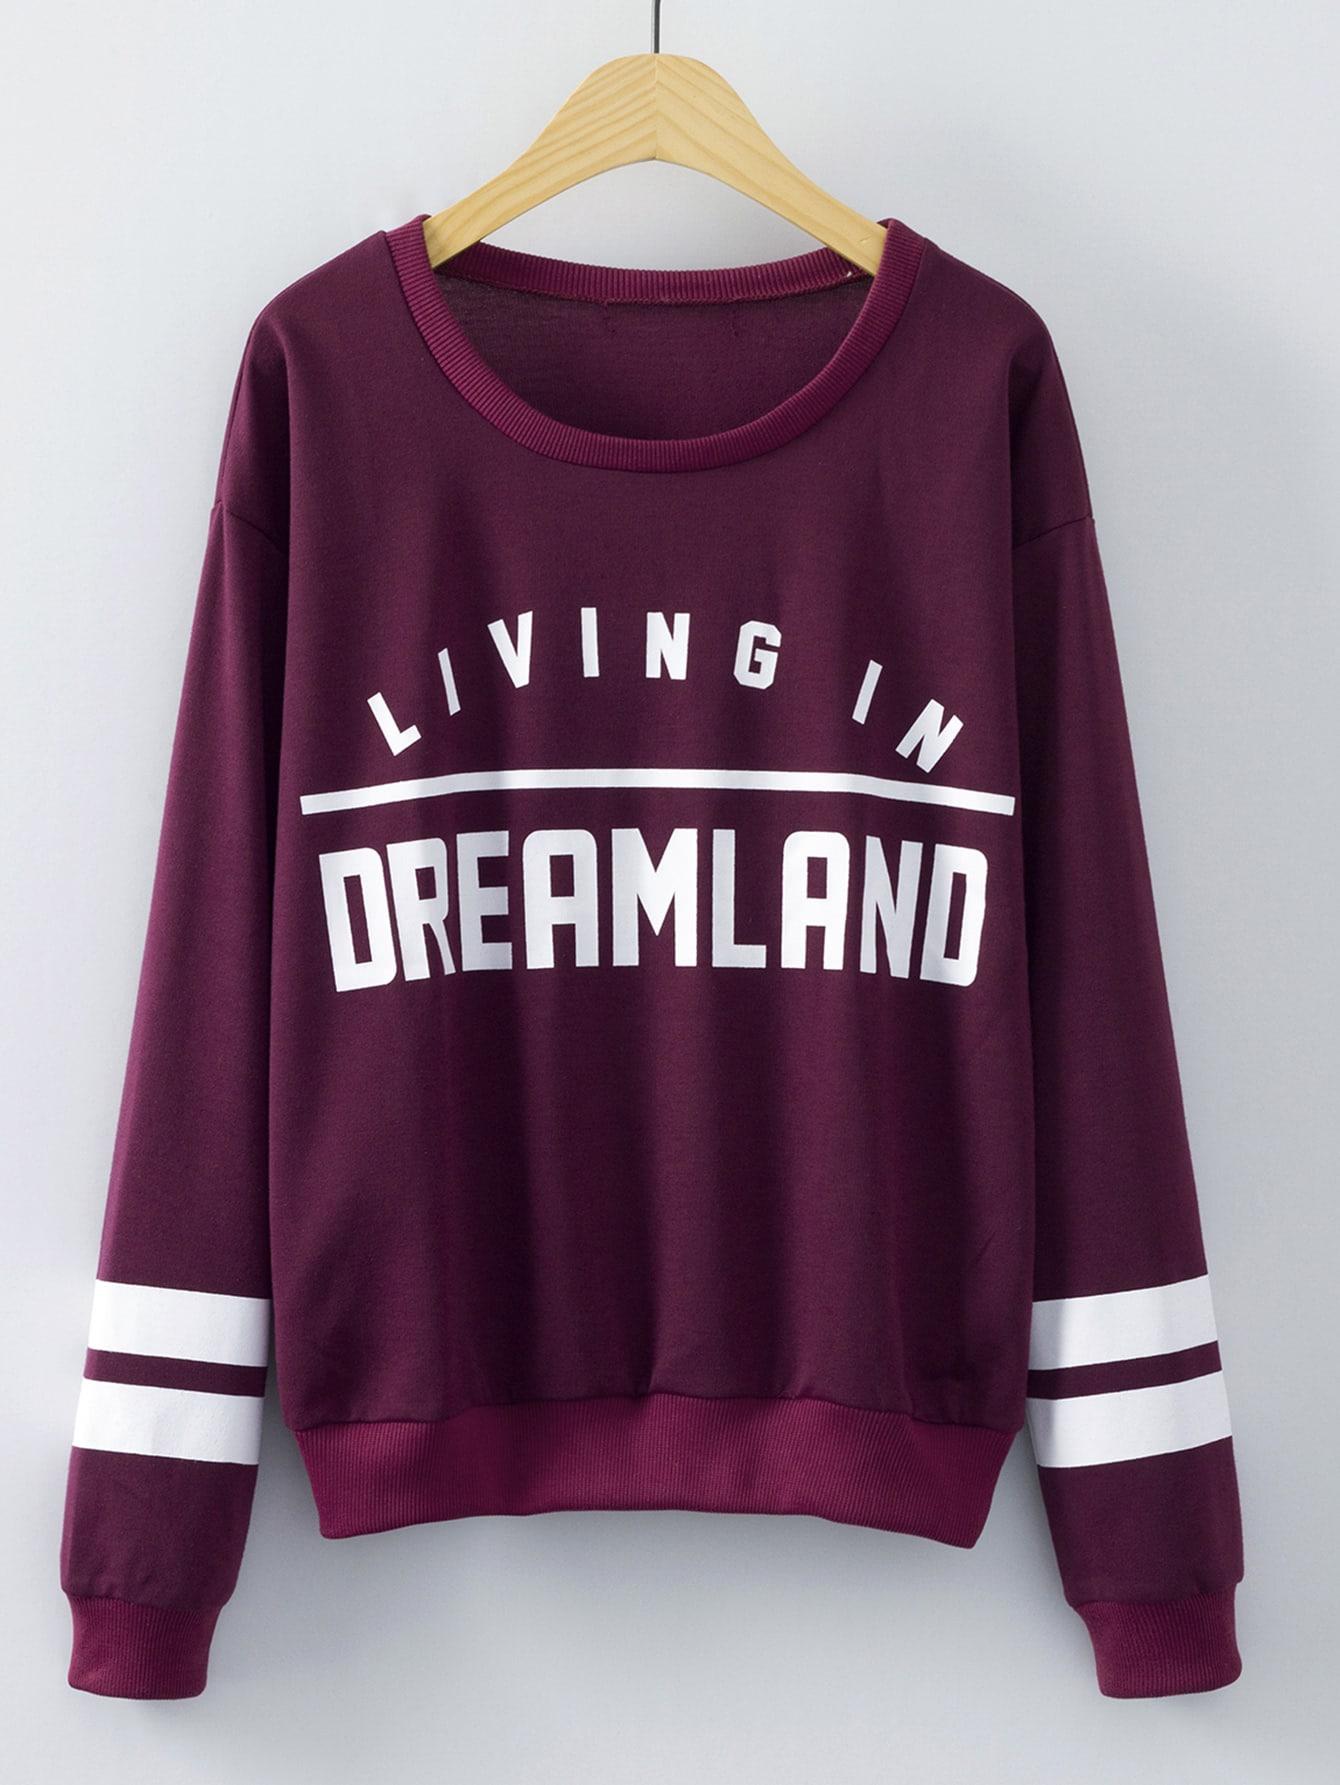 Burgundy Round Neck Letters Print Sweatshirt sweatshirt150904208